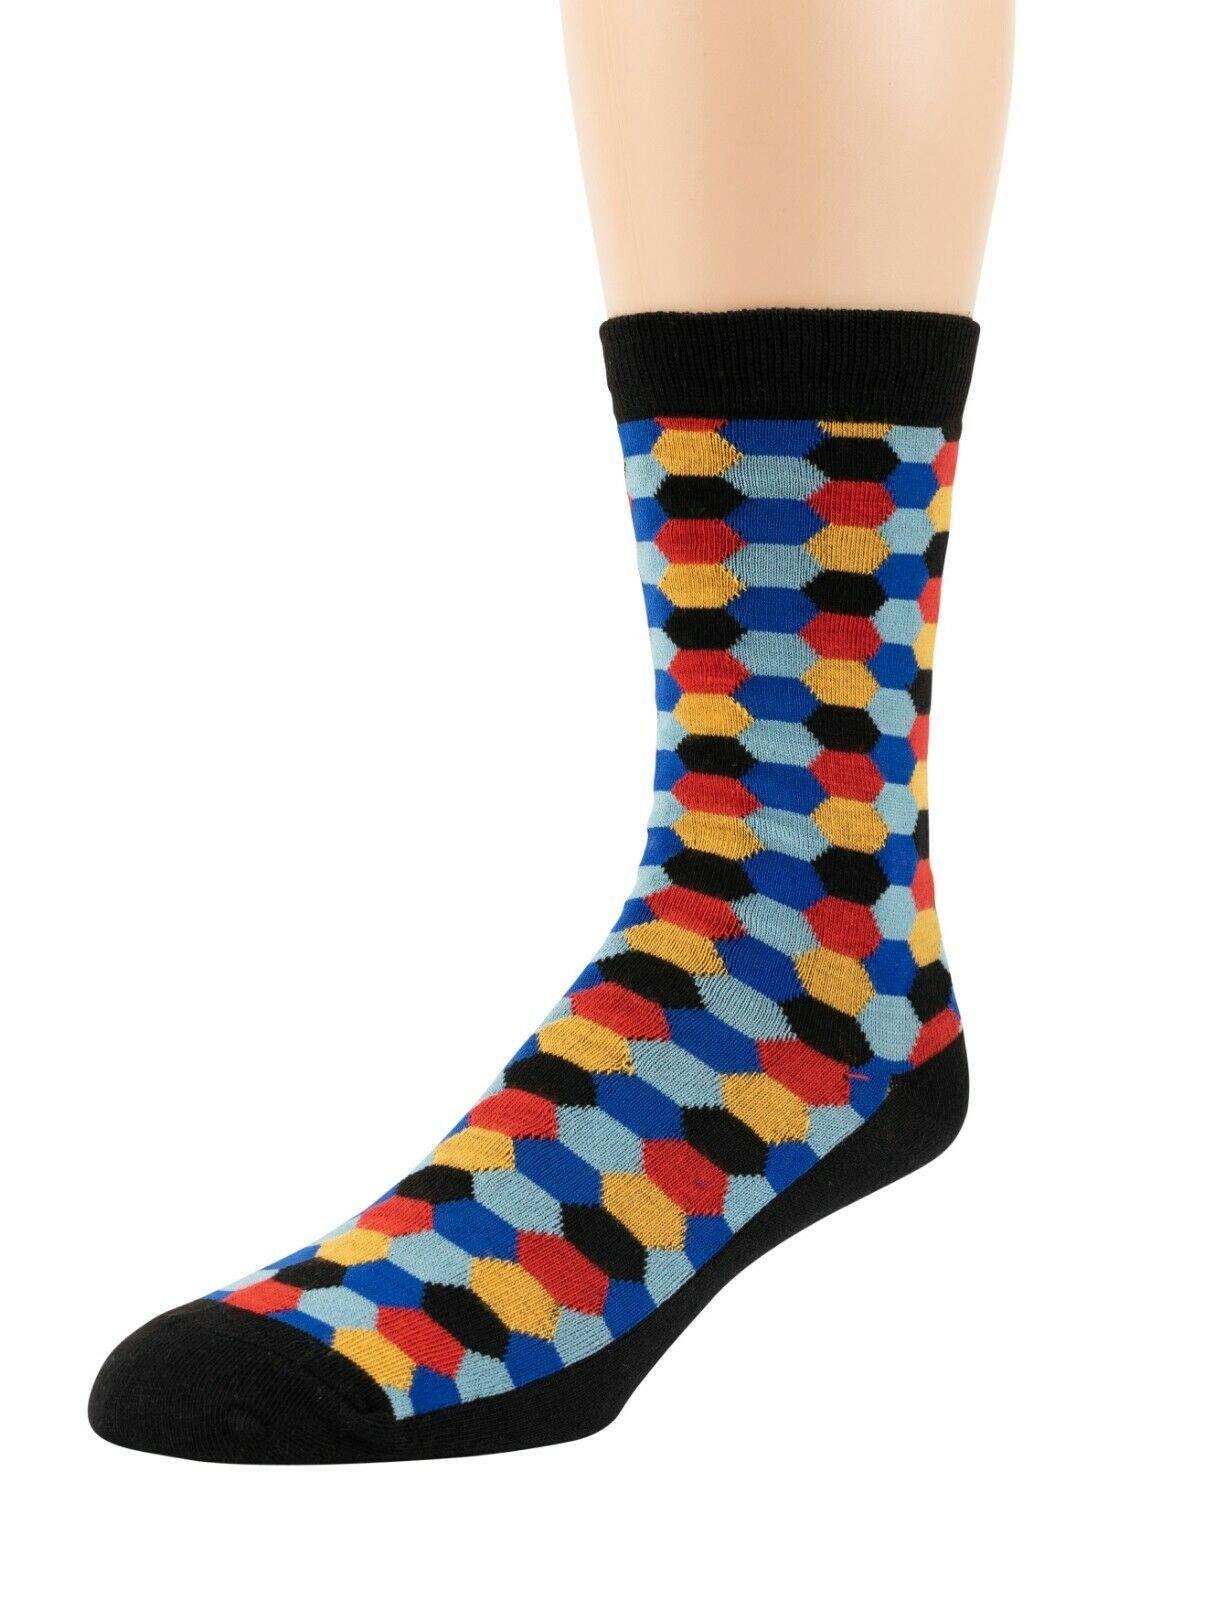 Mitch-Bogen-Mens-Cotton-Dress-Socks-Colorful-Fashion-Crew-Socks-8-Pack-Gift-Box thumbnail 12